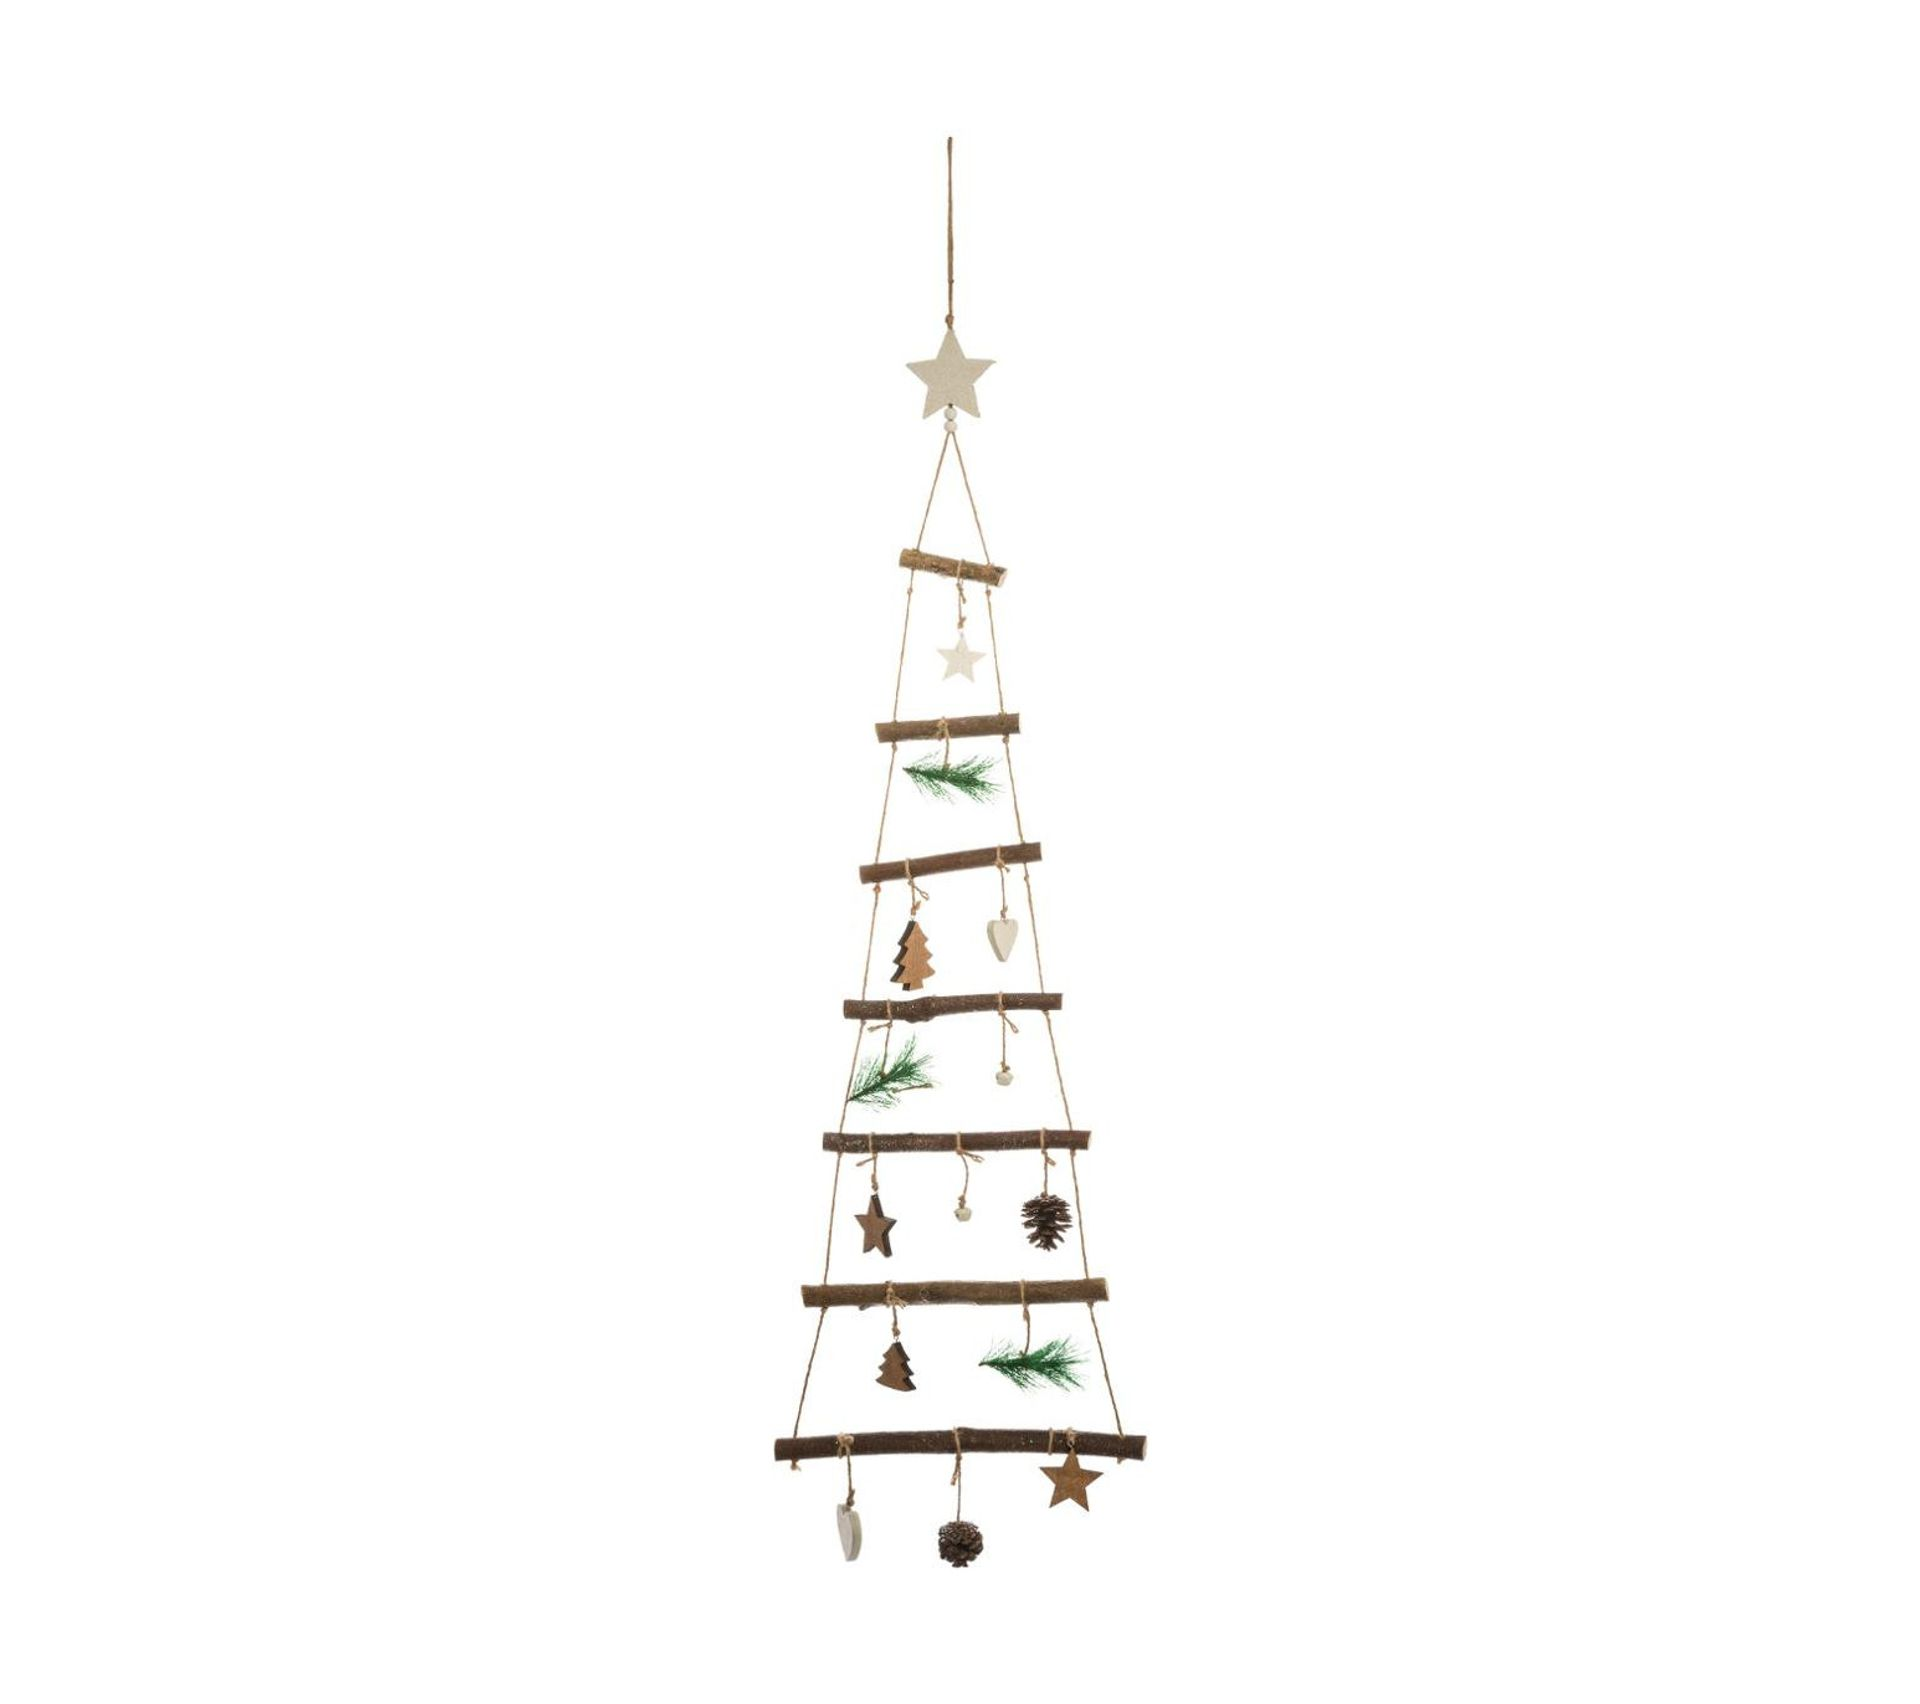 Sapin De Noel Suspendu En Bois décoration de noël sapin À suspendre en bois avec déco h 75 cm un noël  kinfolk